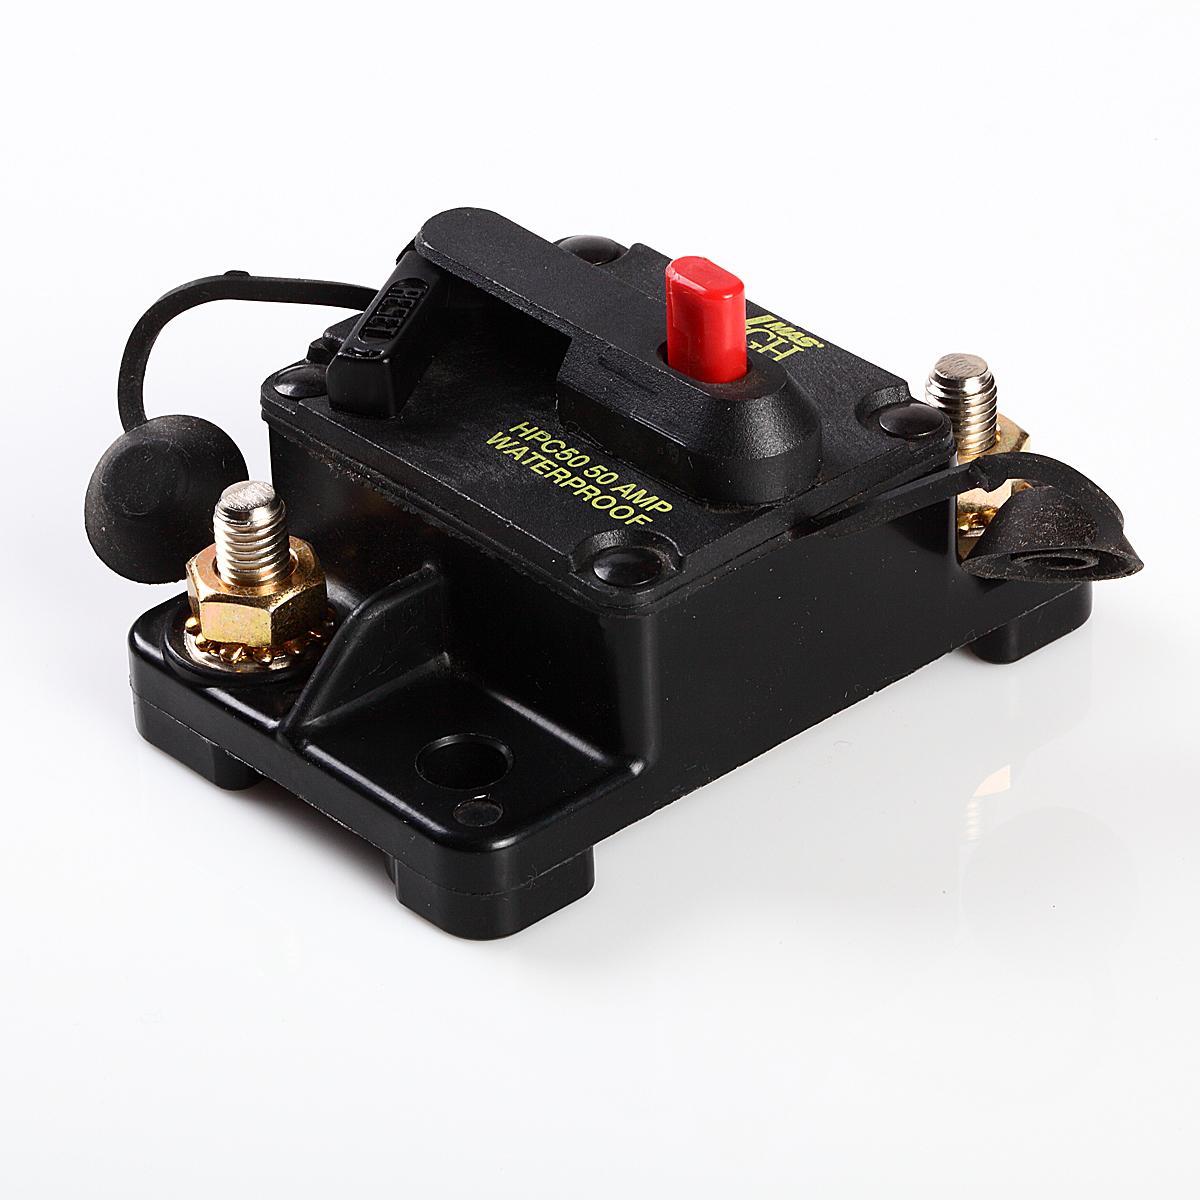 Waterproof 120 Amp Manual Reset Circuit Breaker 12v Car Auto Boat Audio Fuse